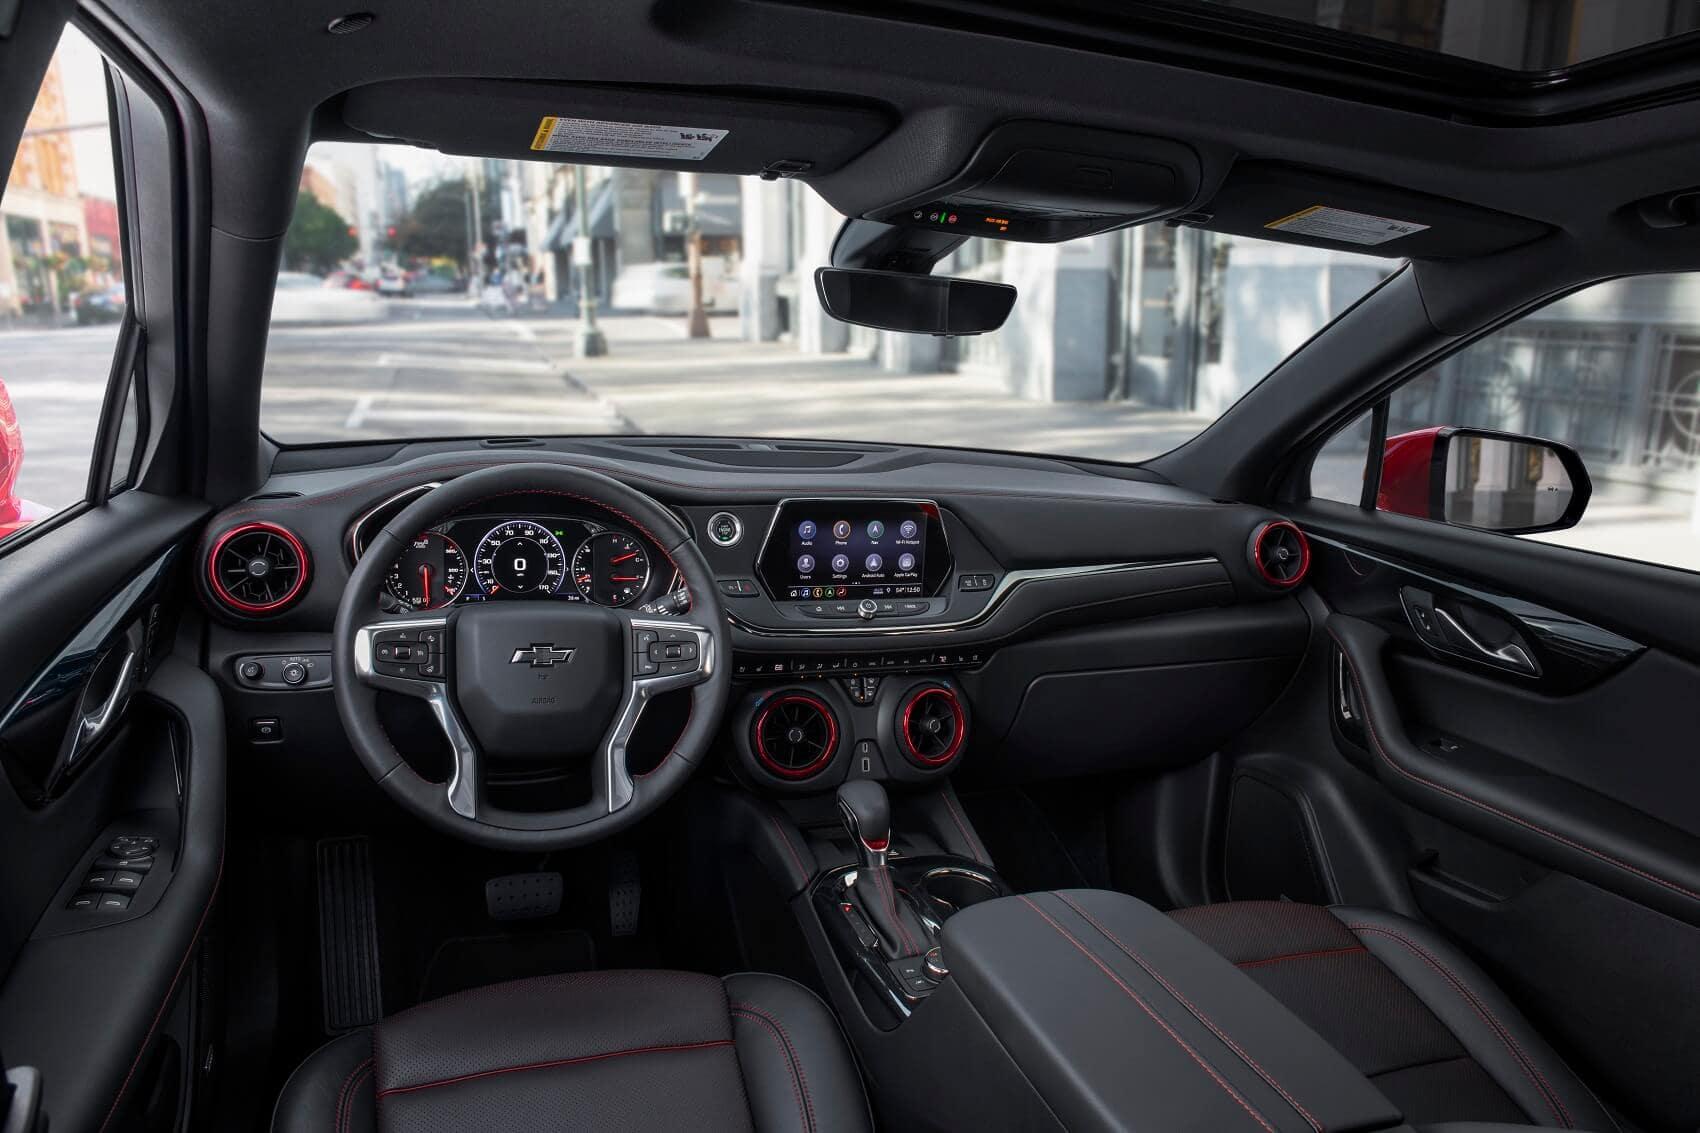 Technology in the Chevy Blazer and Chevy Trailblazer